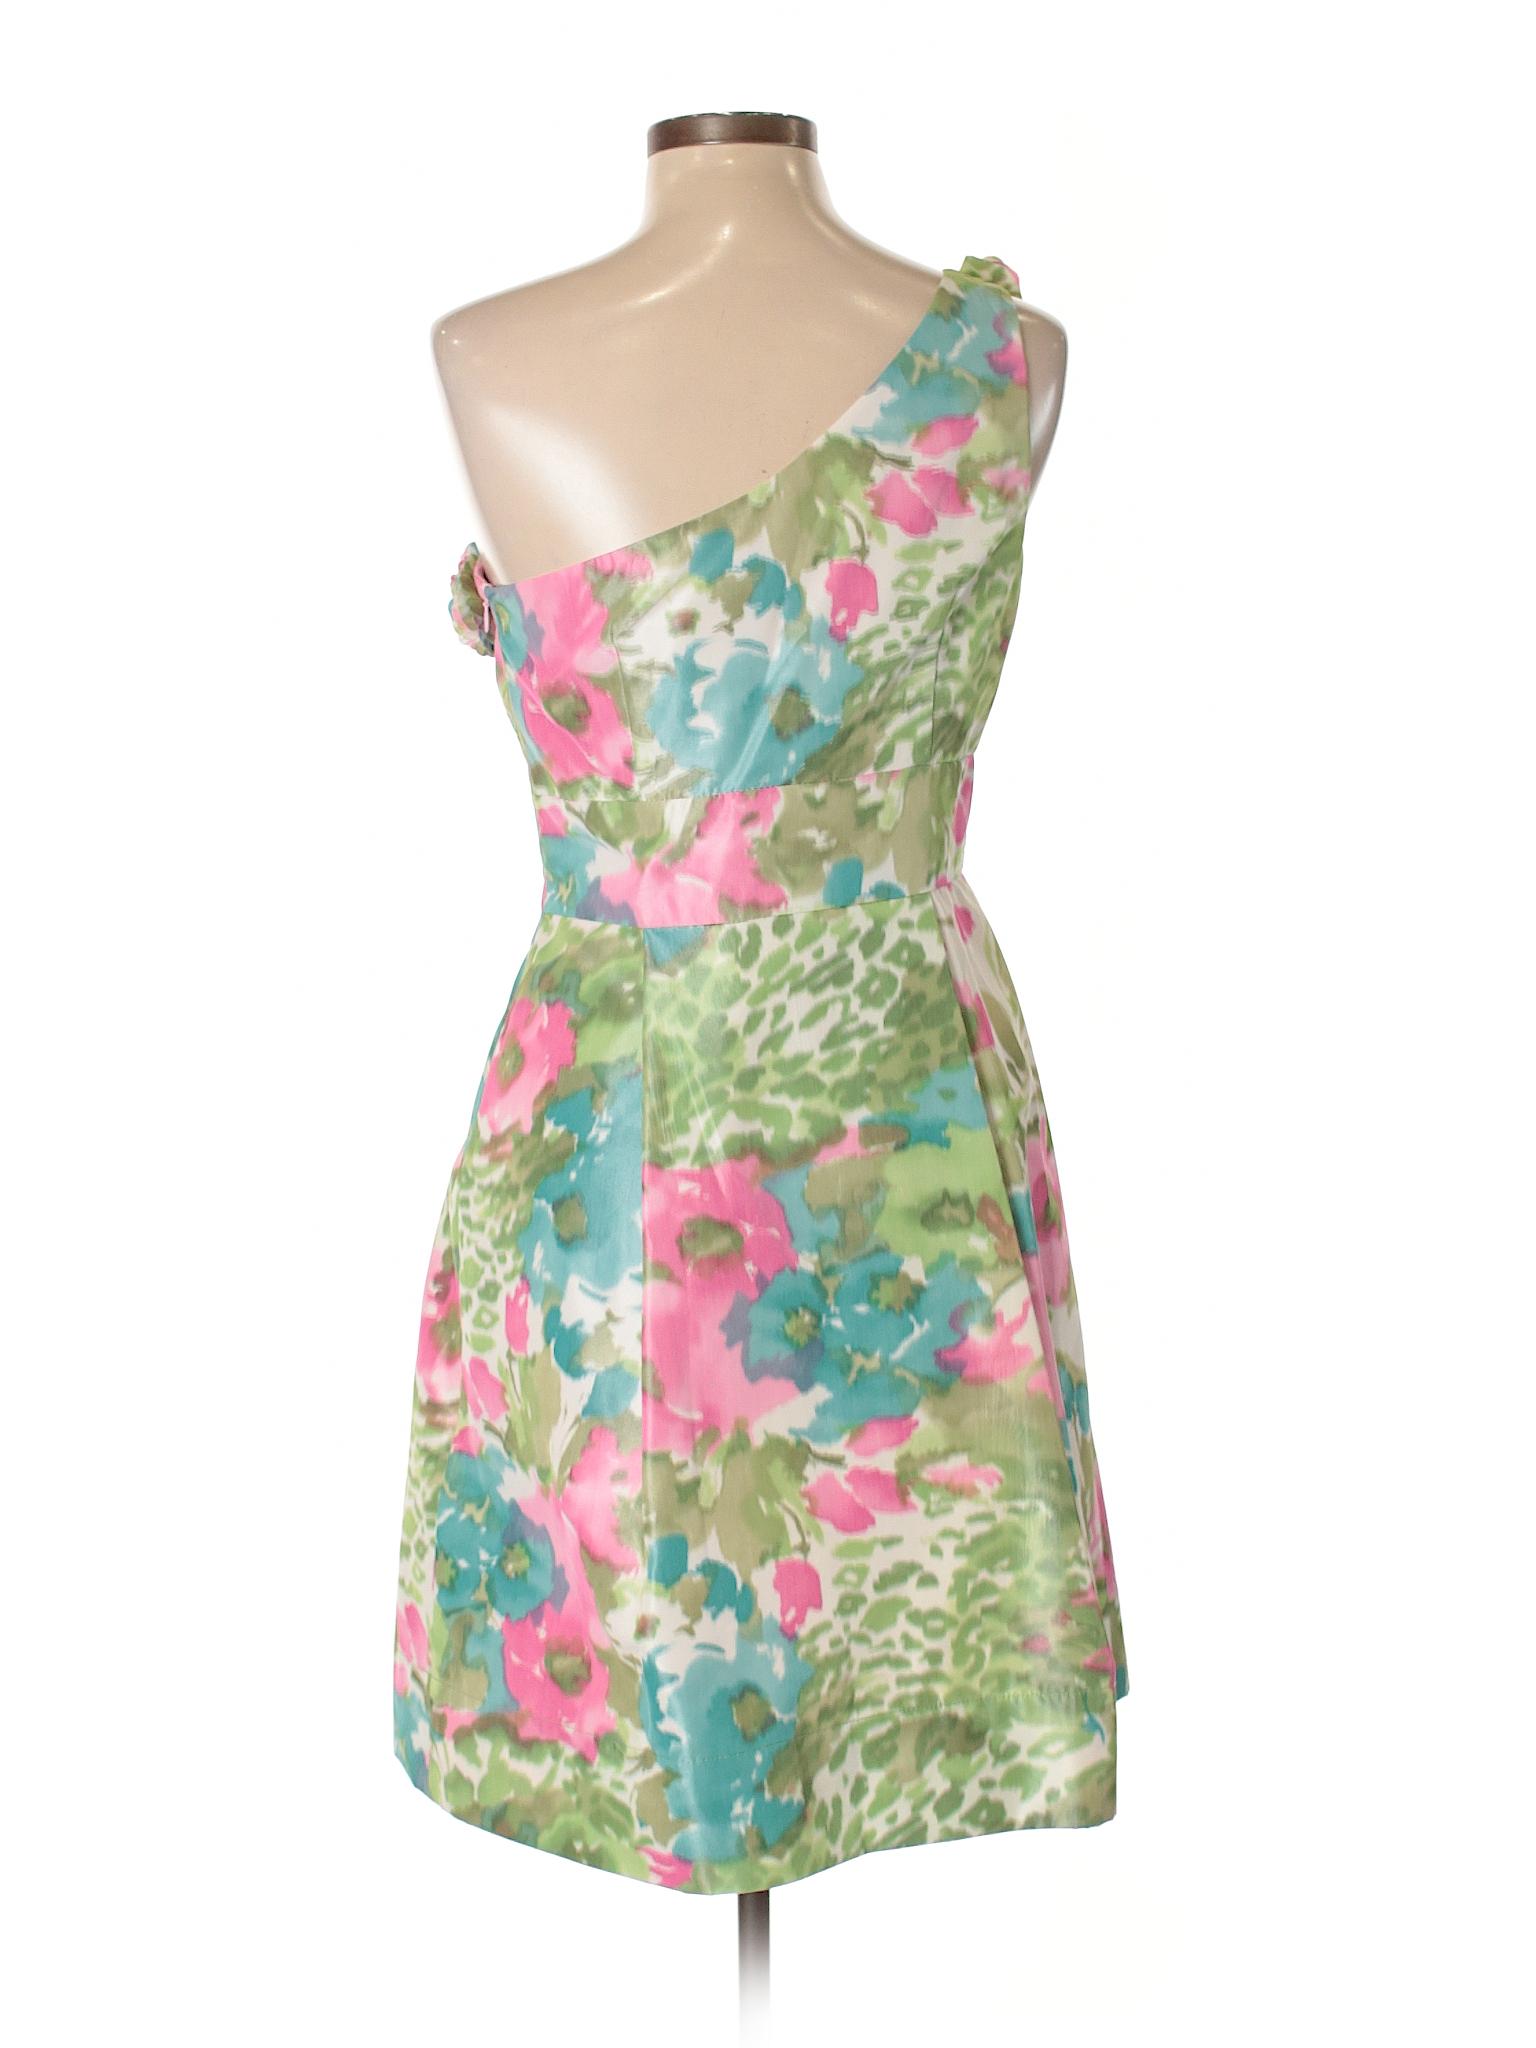 Casual winter Dress Boutique Eliza J qx76fZnAa